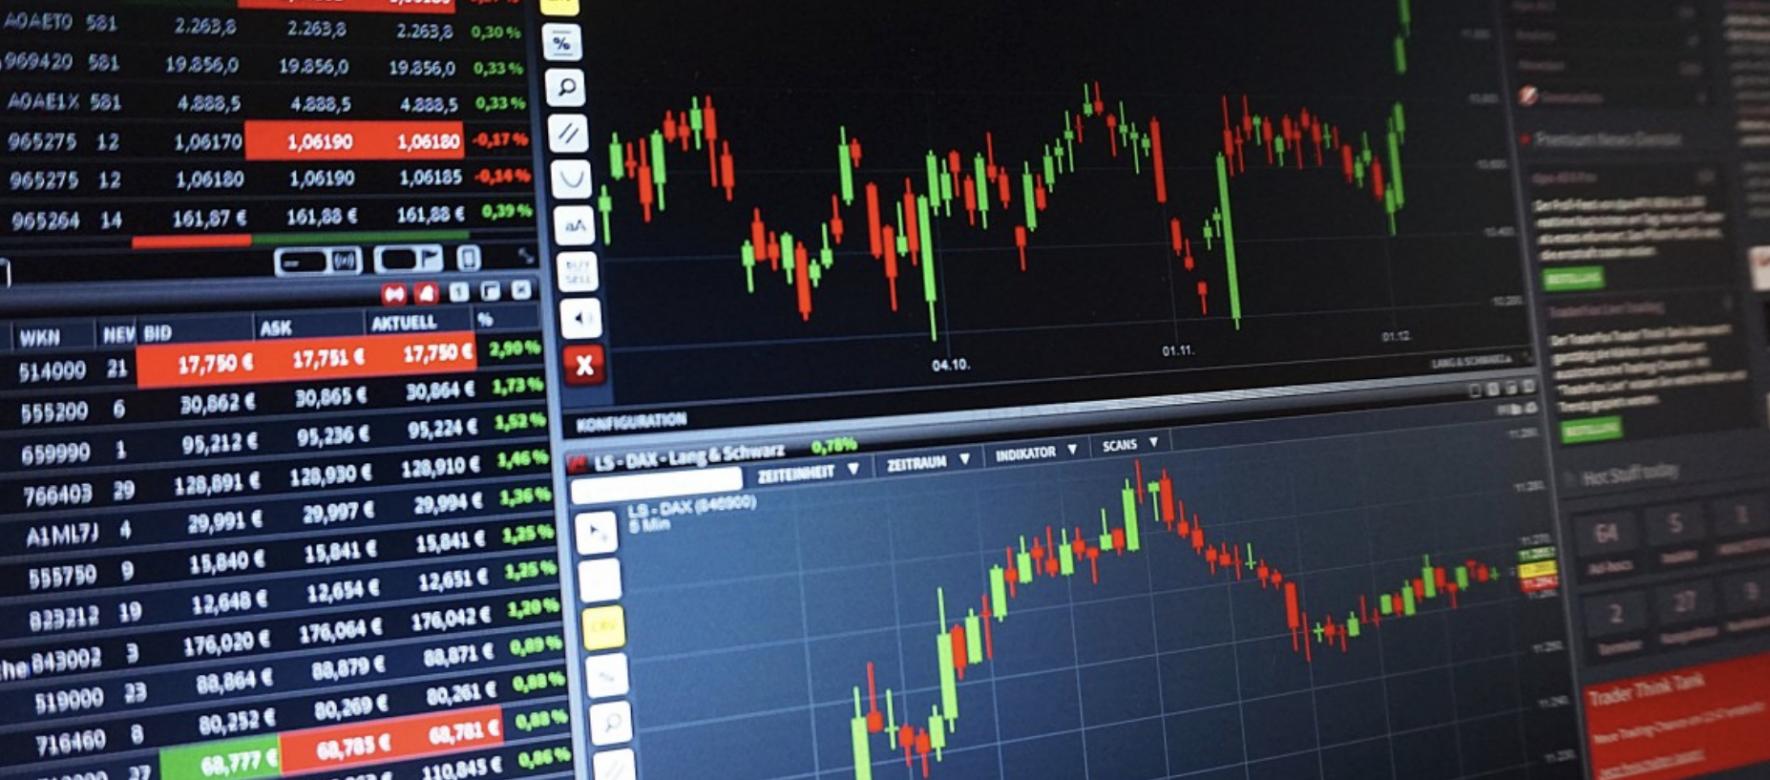 Maroc : La seconde vague de covid-19 inquiète les investisseurs